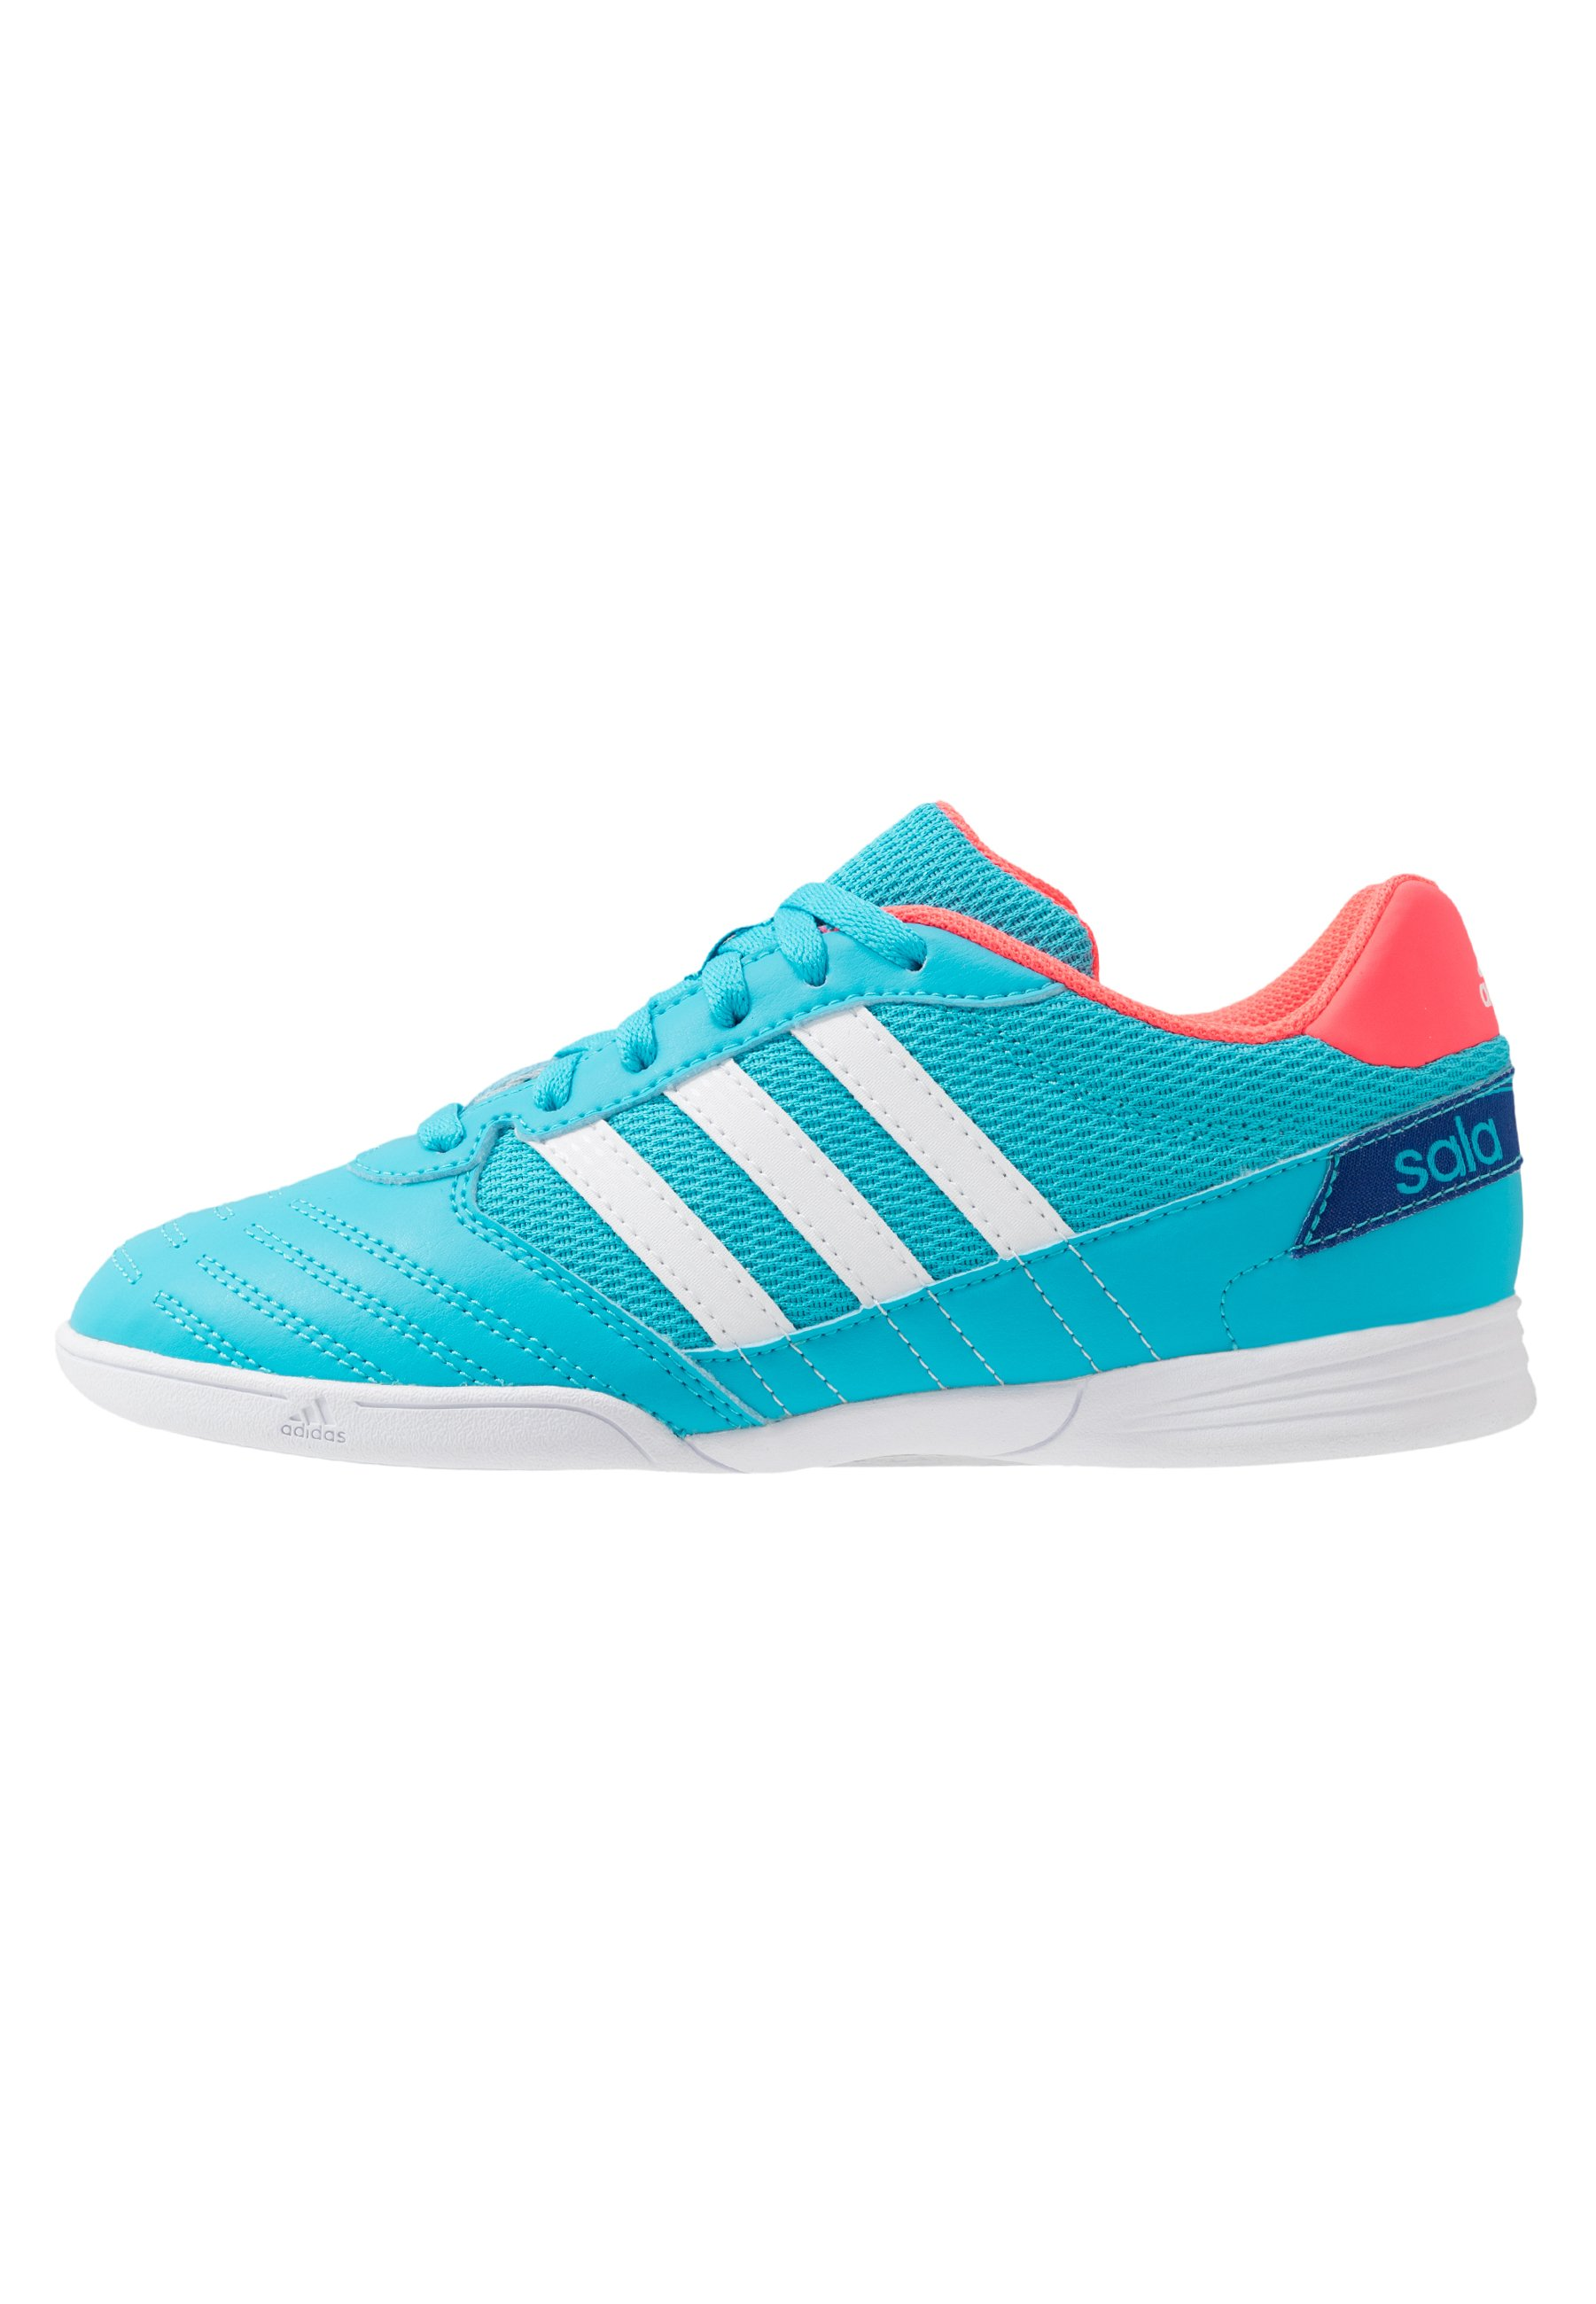 SUPER SALA FOOTBALL SHOES INDOOR Fotbollsskor inomhusskor signal cyansignal pinkroyal blue